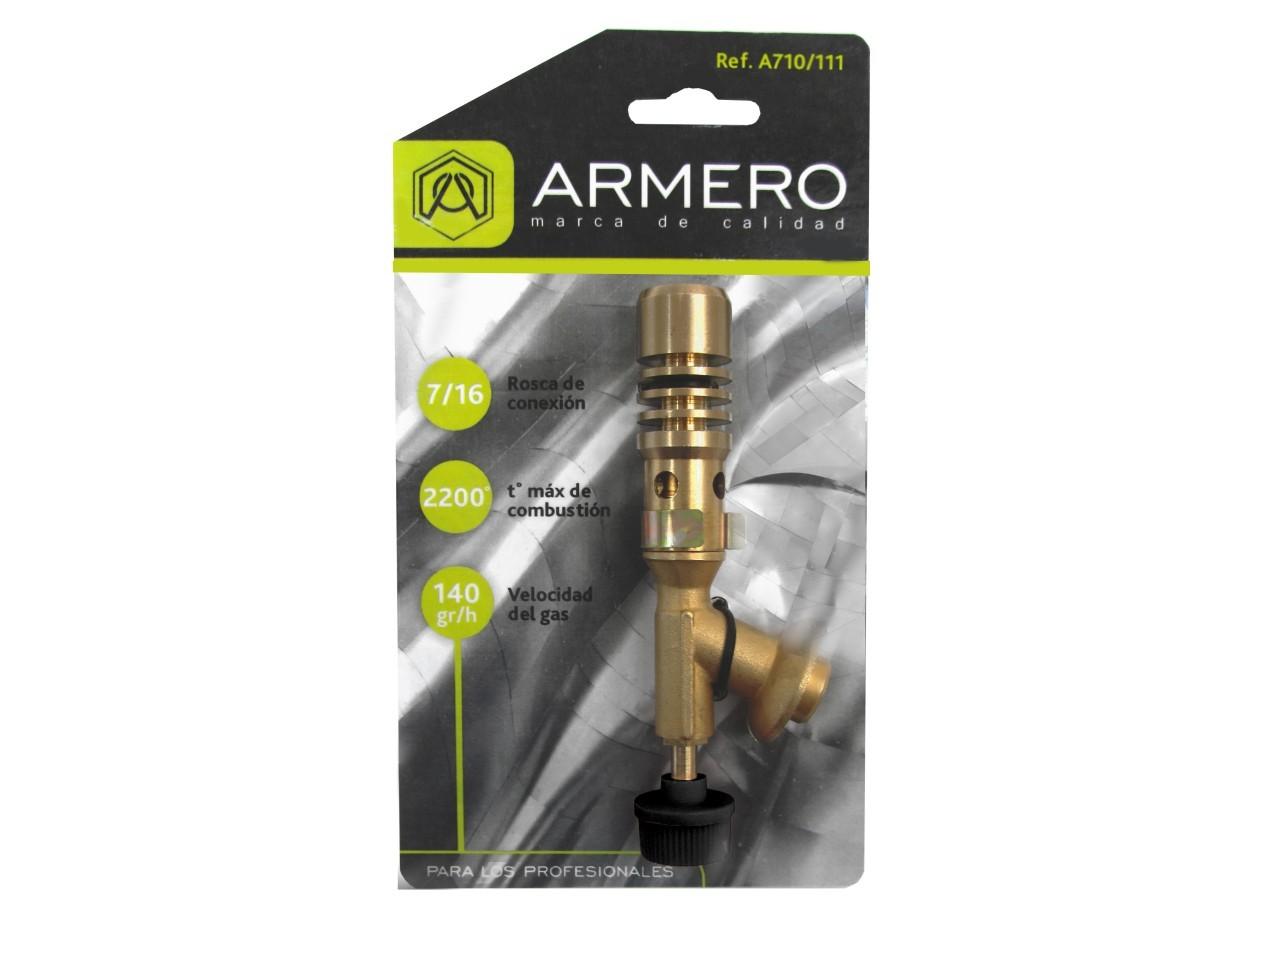 Горелка газовая Armero Ag10-113